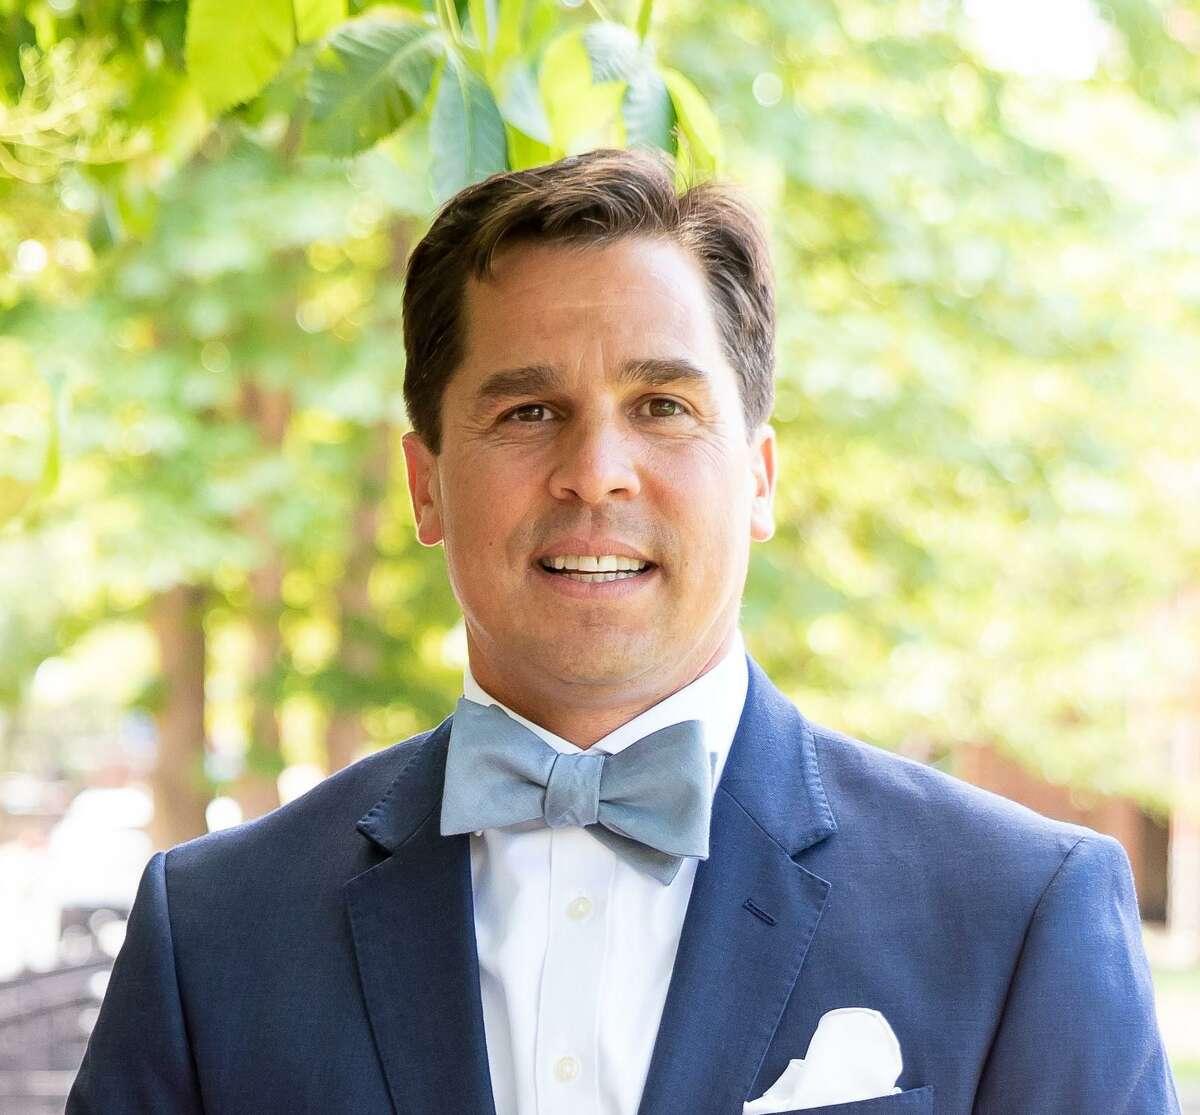 GoNetSpeed CEO Tom Perrone